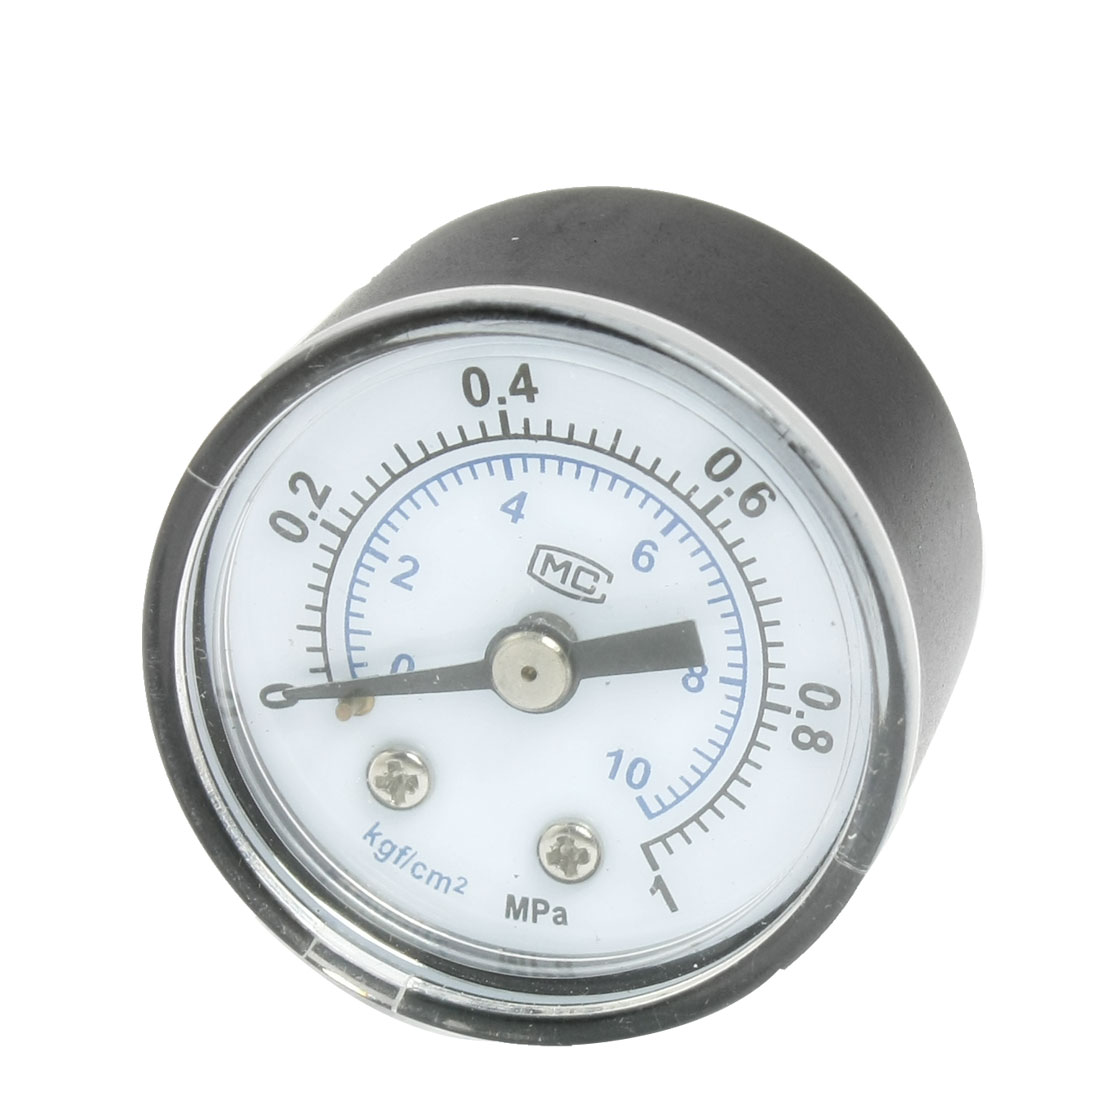 "Unique Bargains Air Compressor Black Numeral 0-1MPa 3/8"" Thread Pressure Gauge Jrjki"